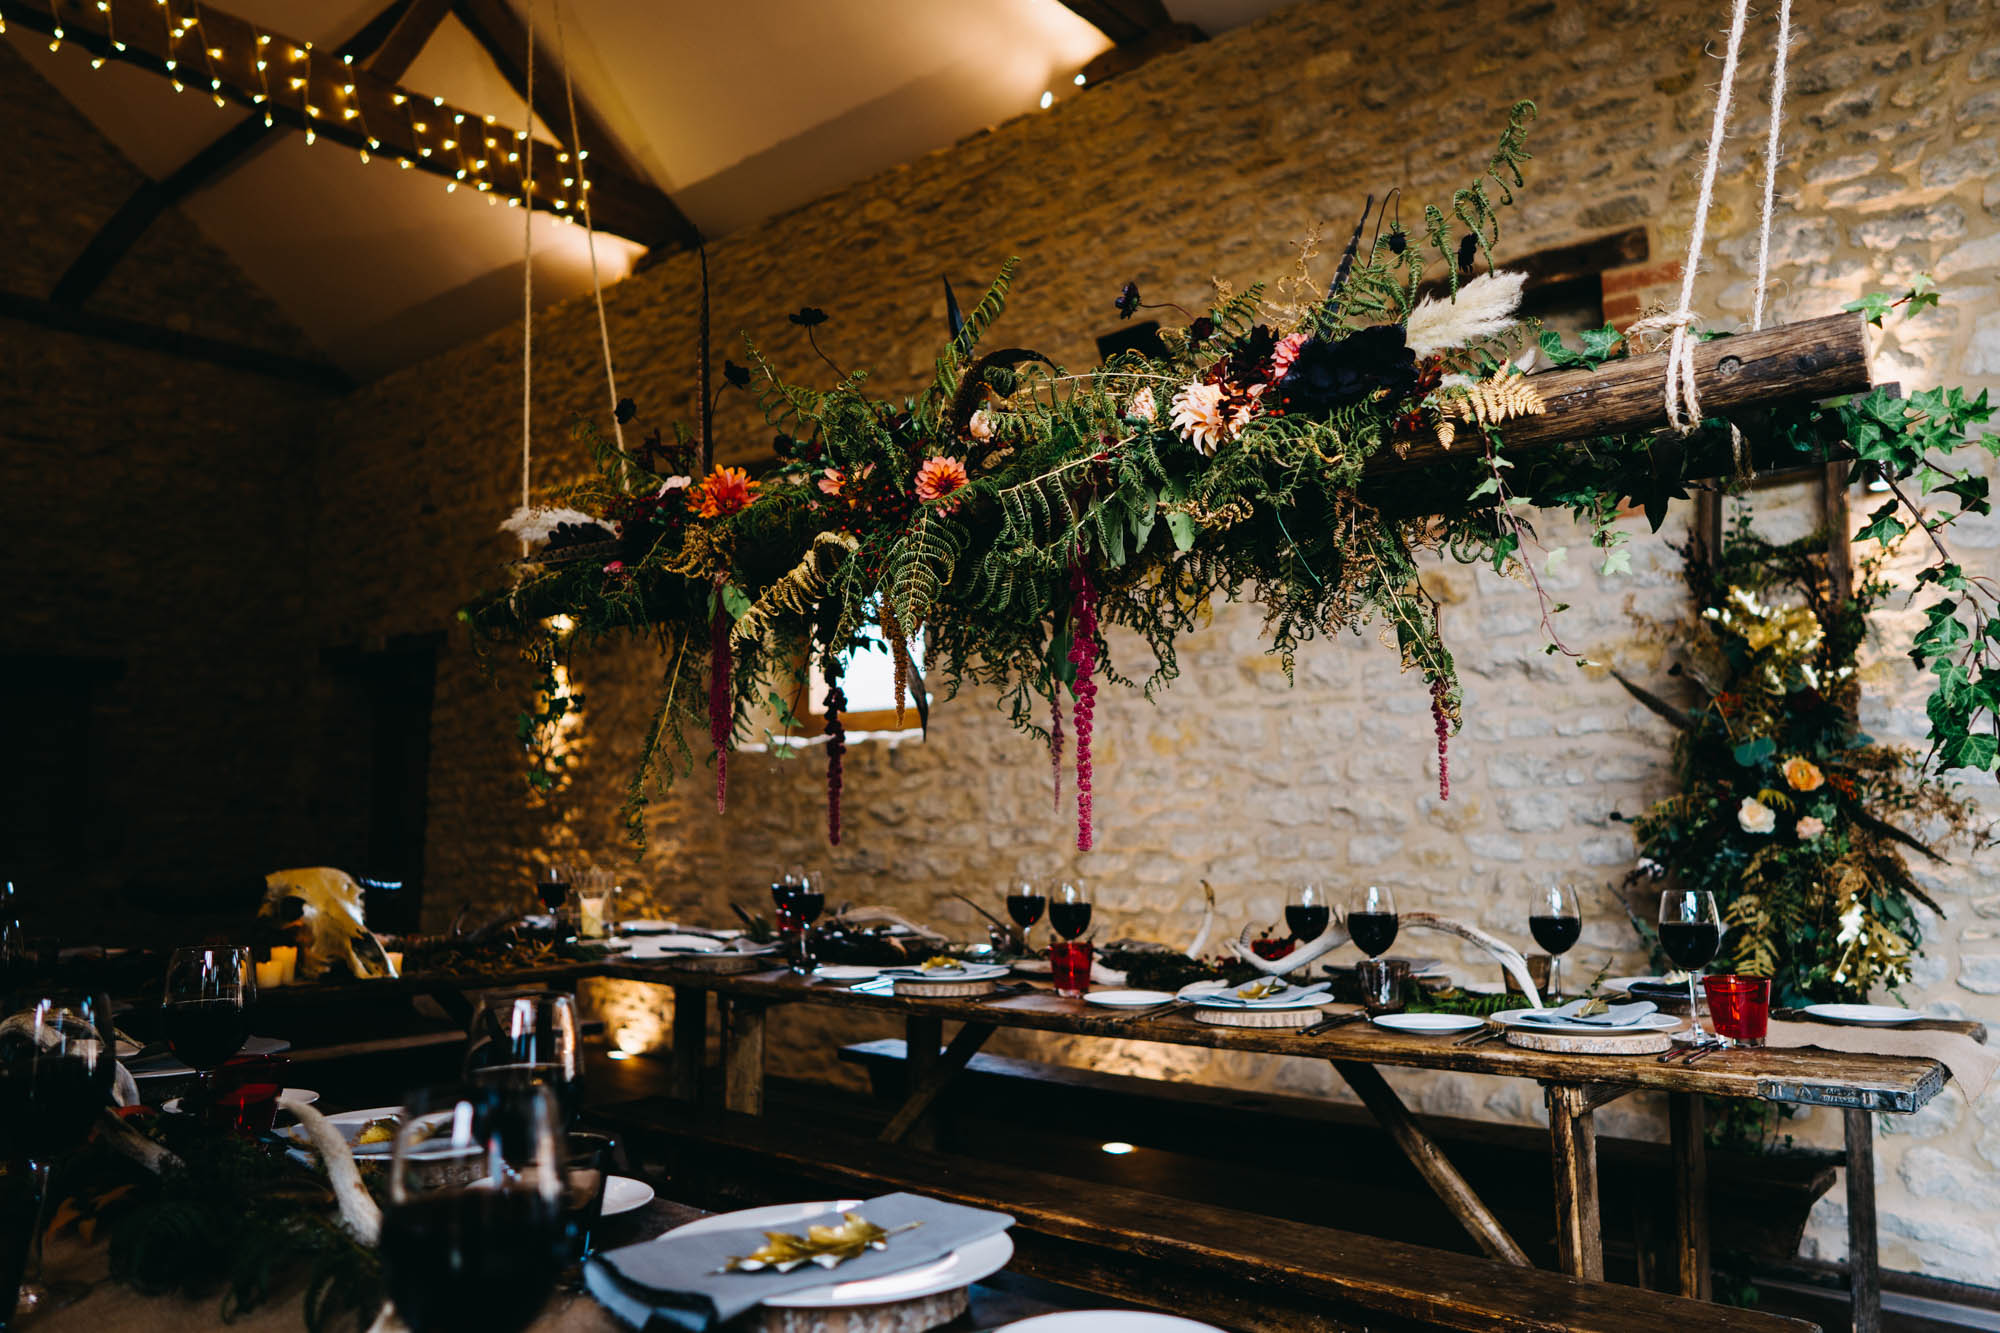 huntsmill-farm-wedding-inspiration-8